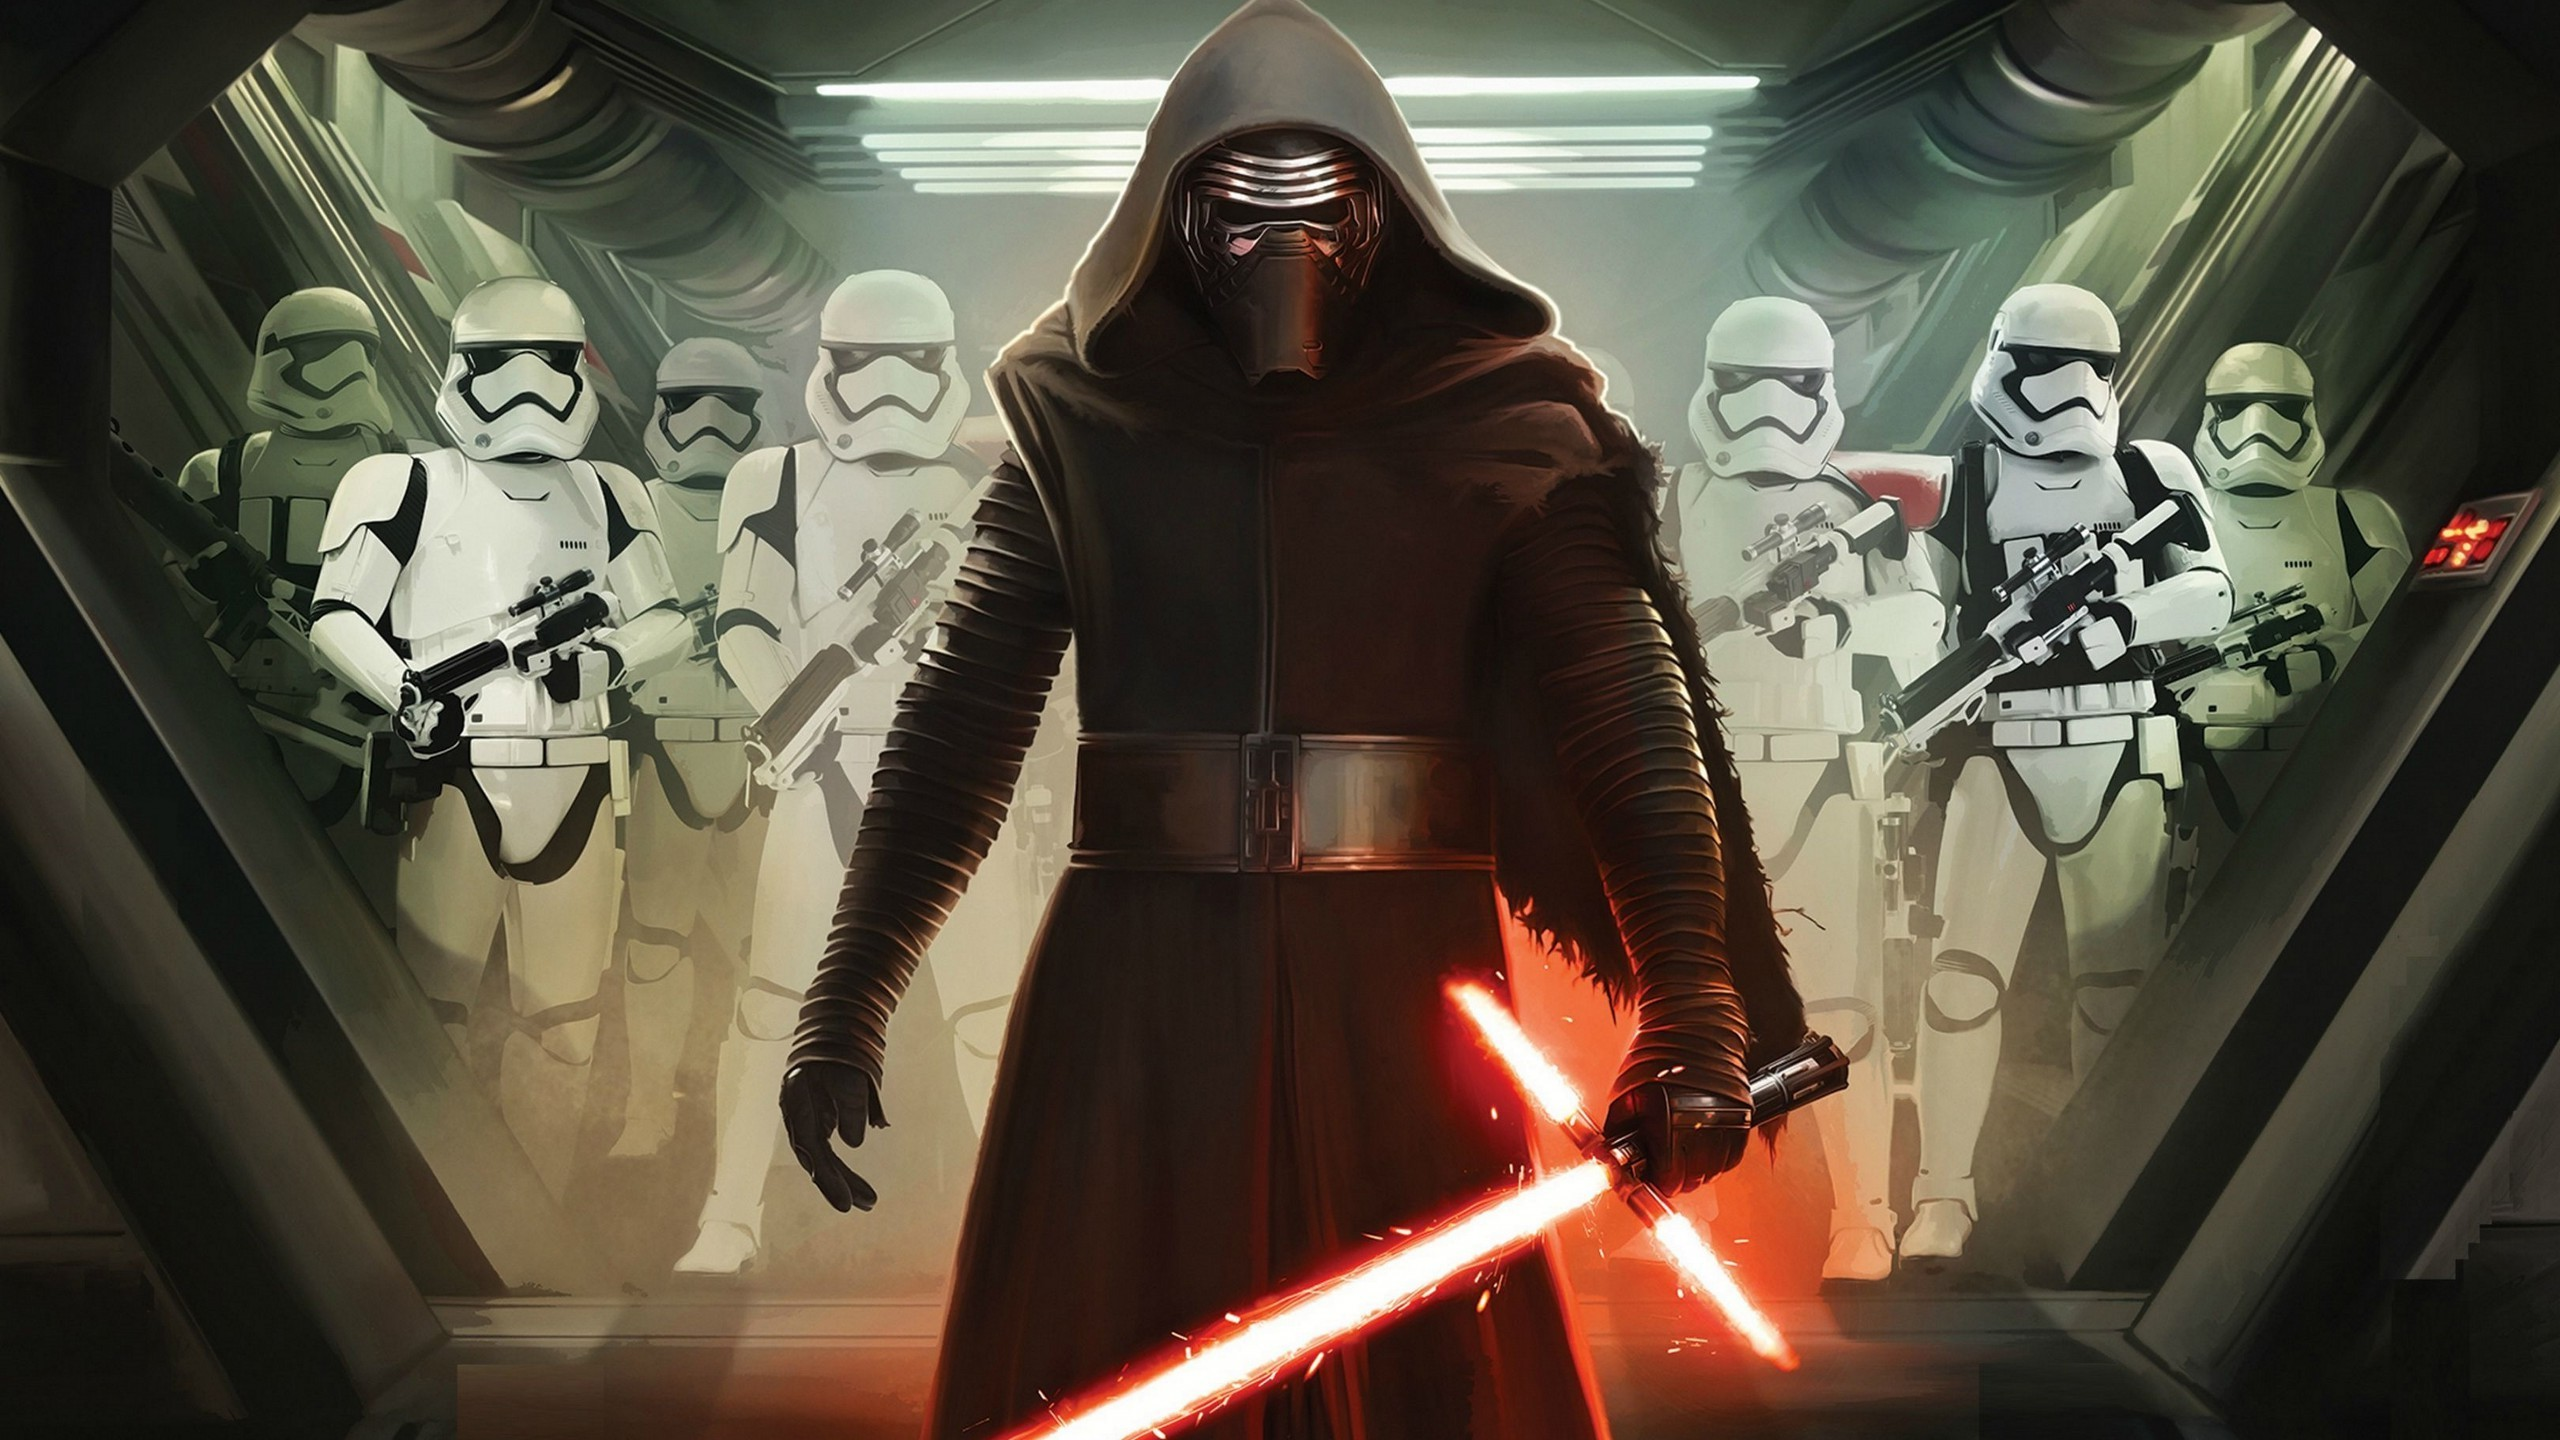 Star Wars, Star Wars: Episode VII The Force Awakens, Kylo Ren, Stormtrooper  Wallpapers HD / Desktop and Mobile Backgrounds